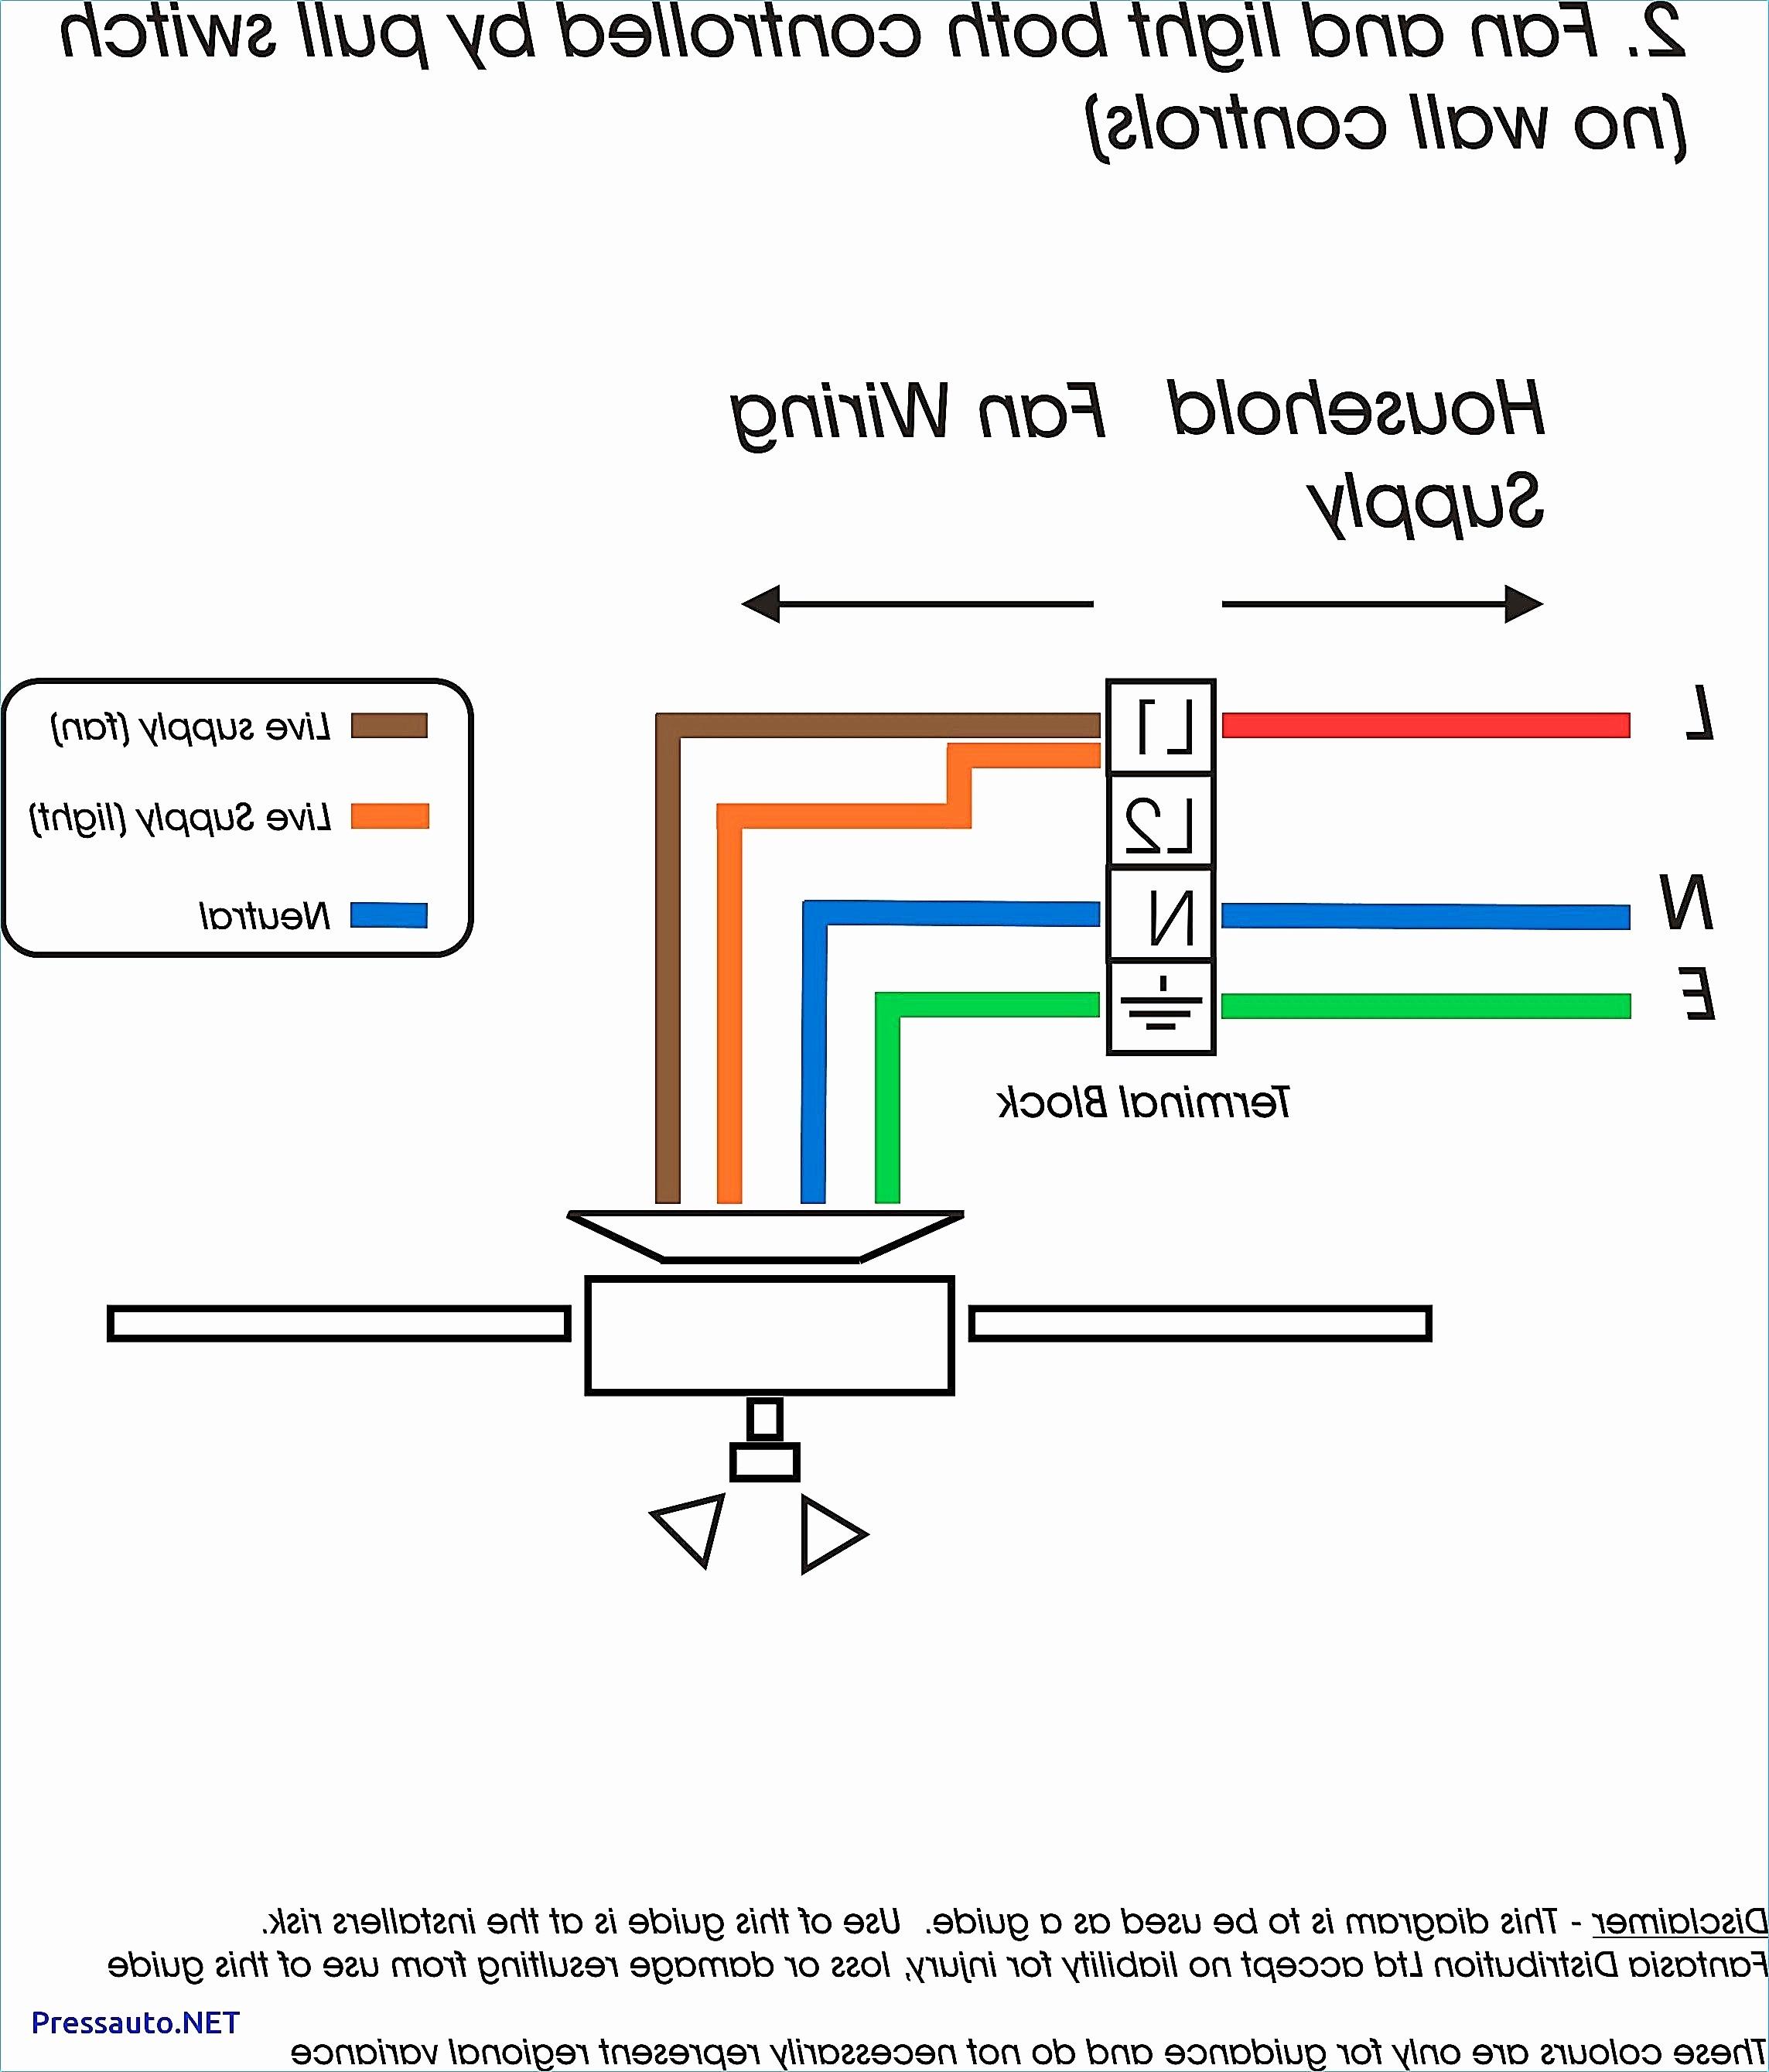 kohler ignition switch wiring diagram Download-Kohler Engine Wiring Diagram Inspirational Wiring Diagram Lawn Mower Kohler Ignition Switch Wiring Diagram Download 11-i